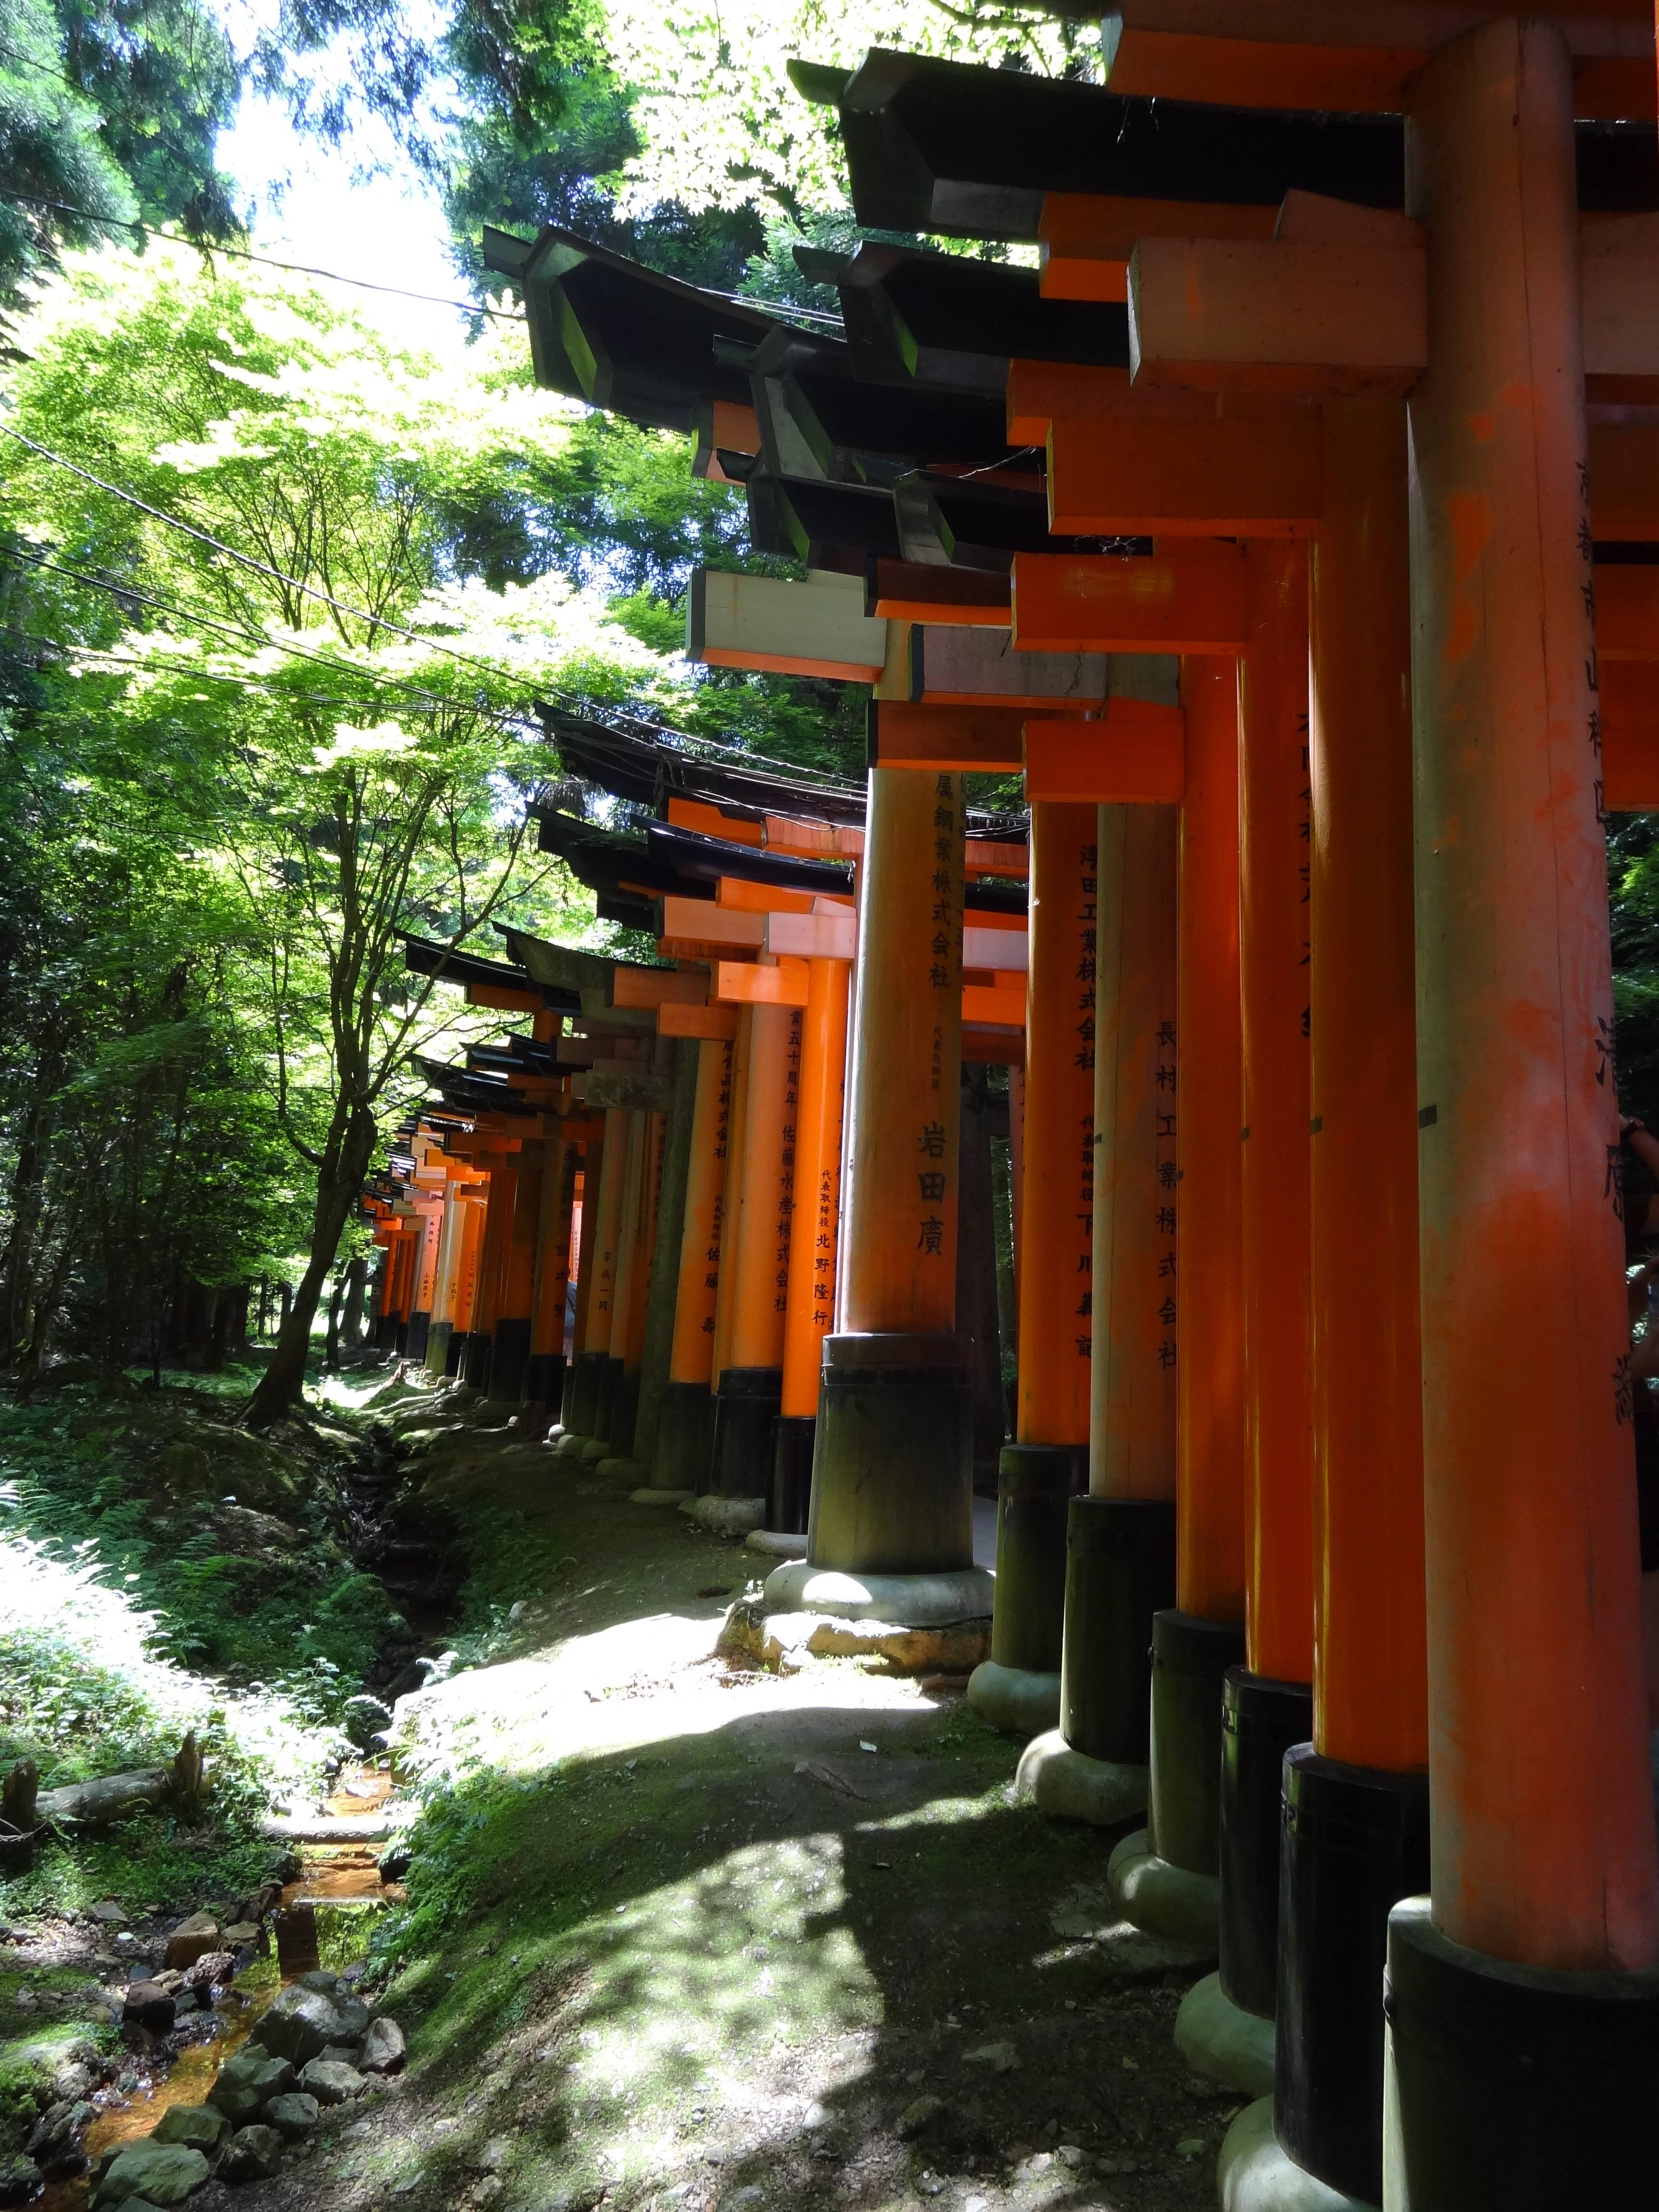 Photo 1: Le sanctuaire aux 10 000 torii, Fushimi Inari